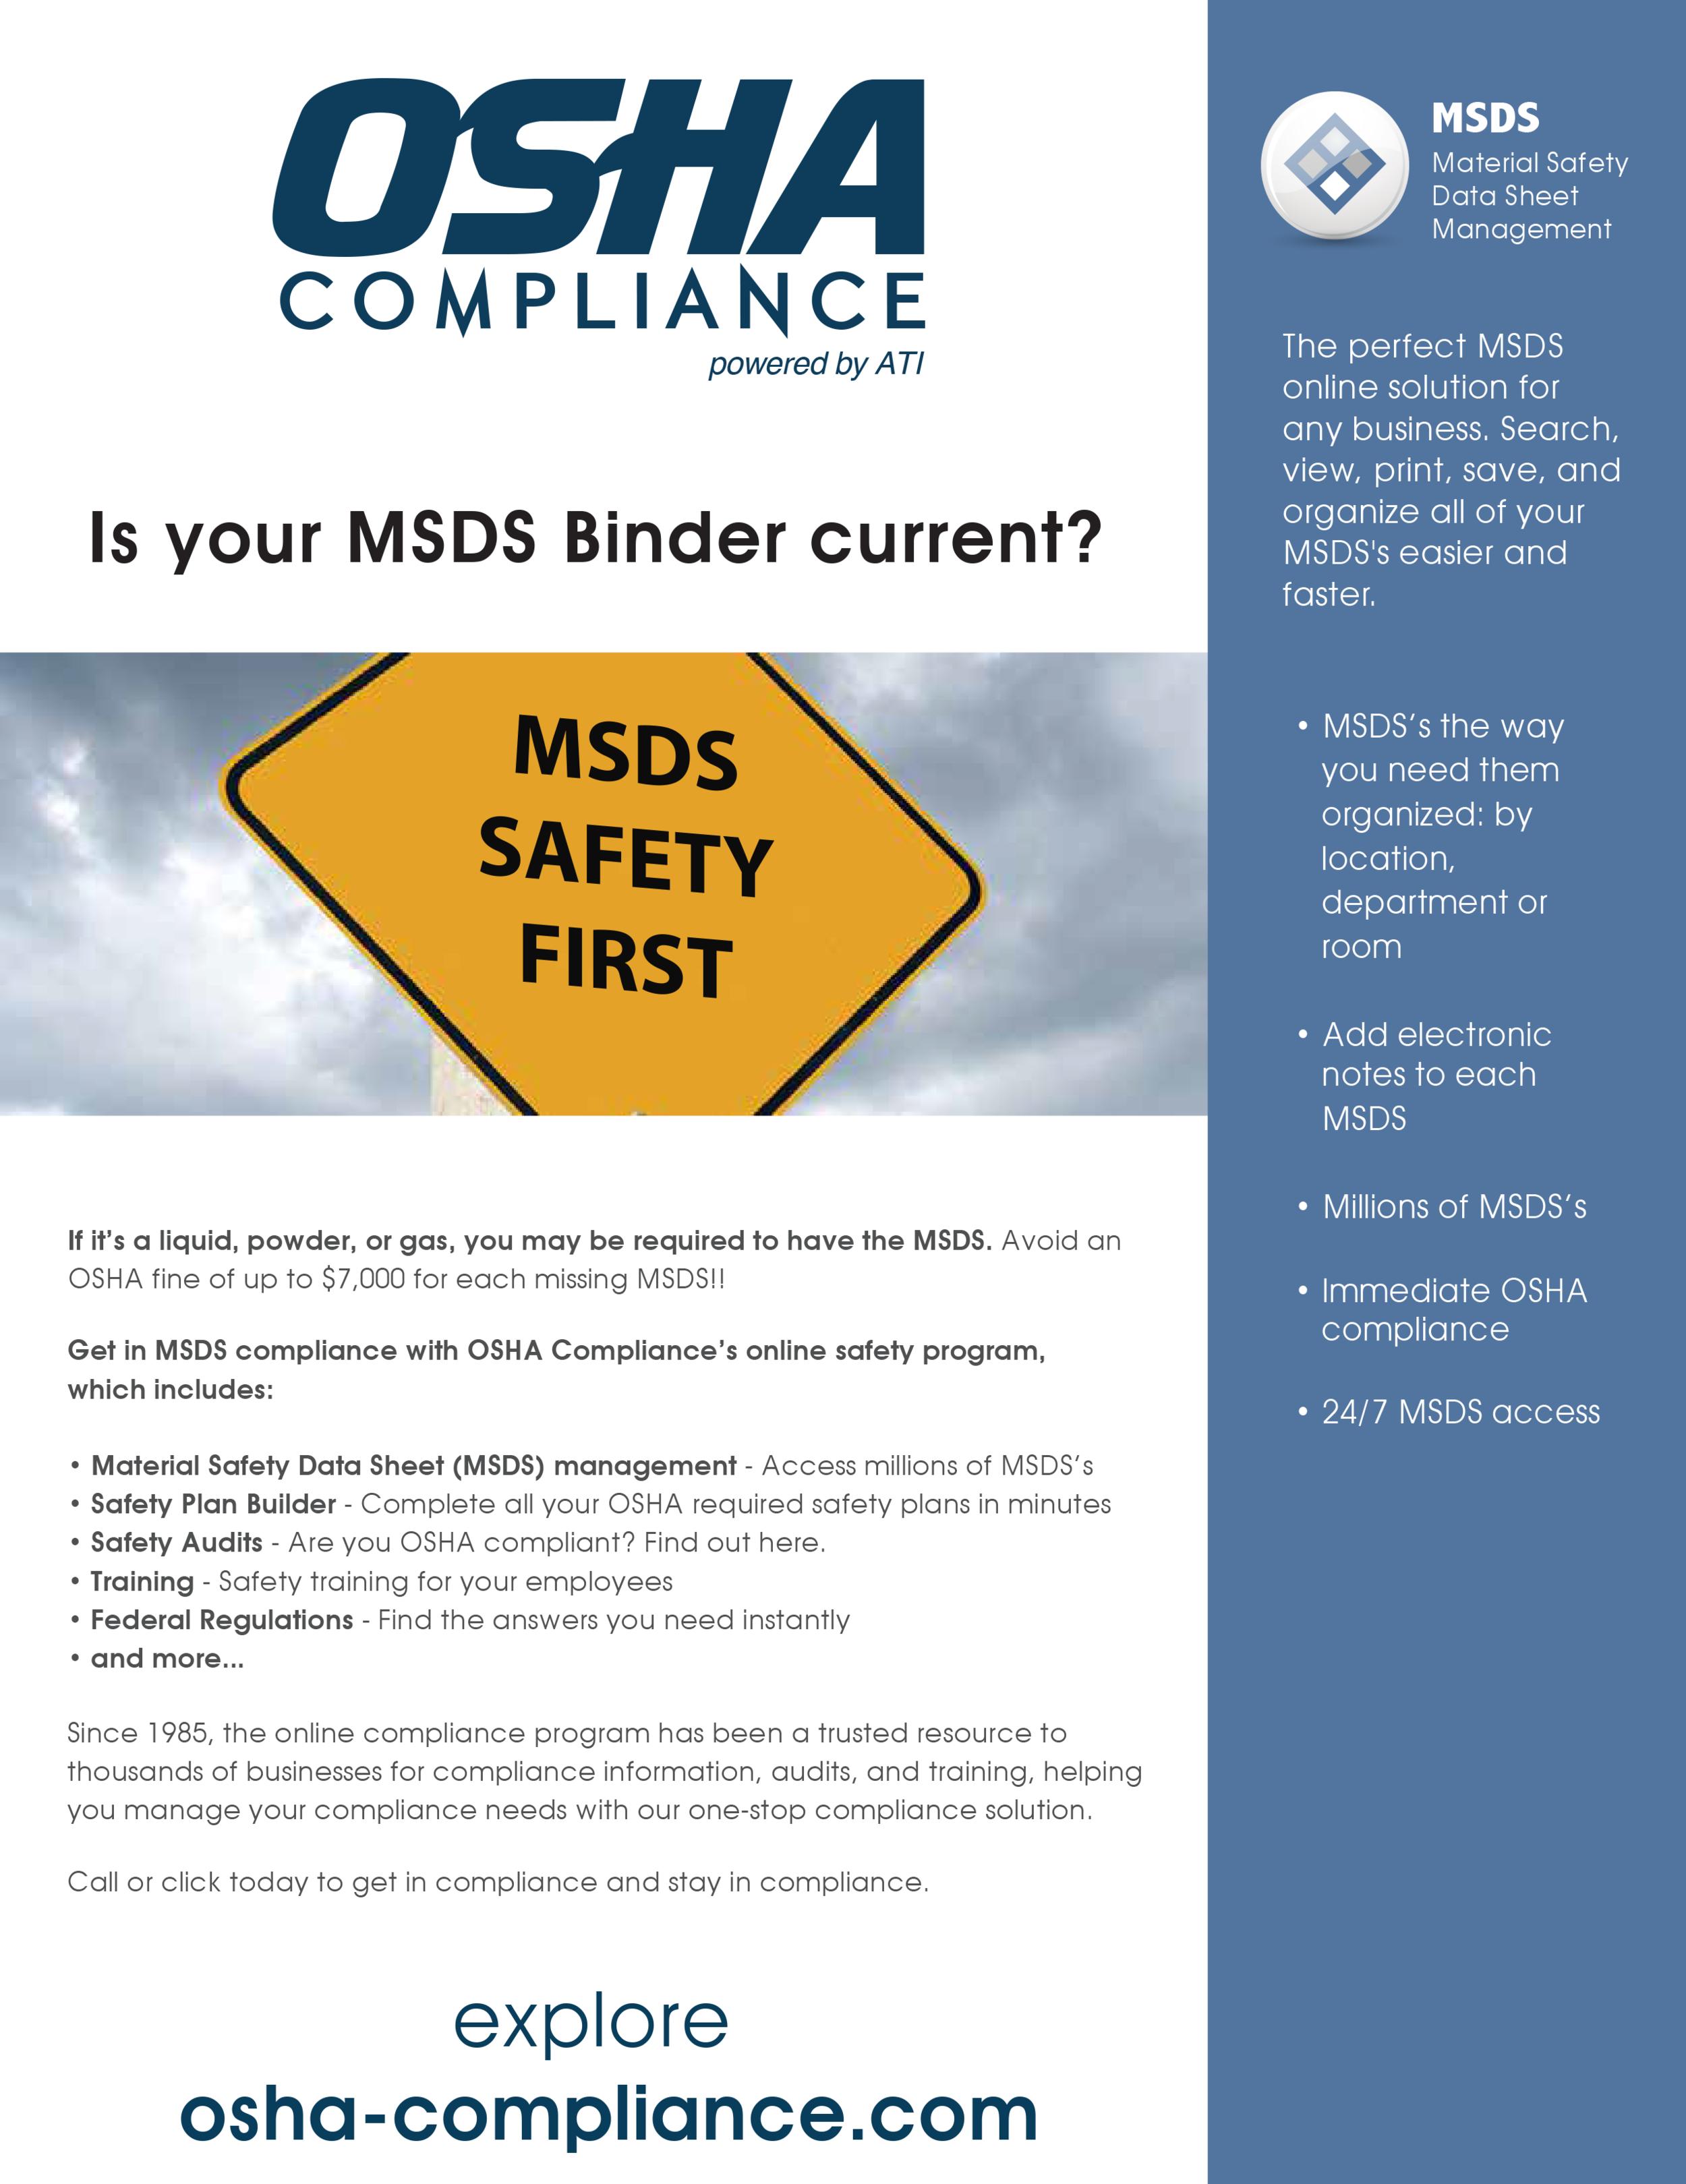 osha_compliance_statement_stuffer_front_msds_web.png